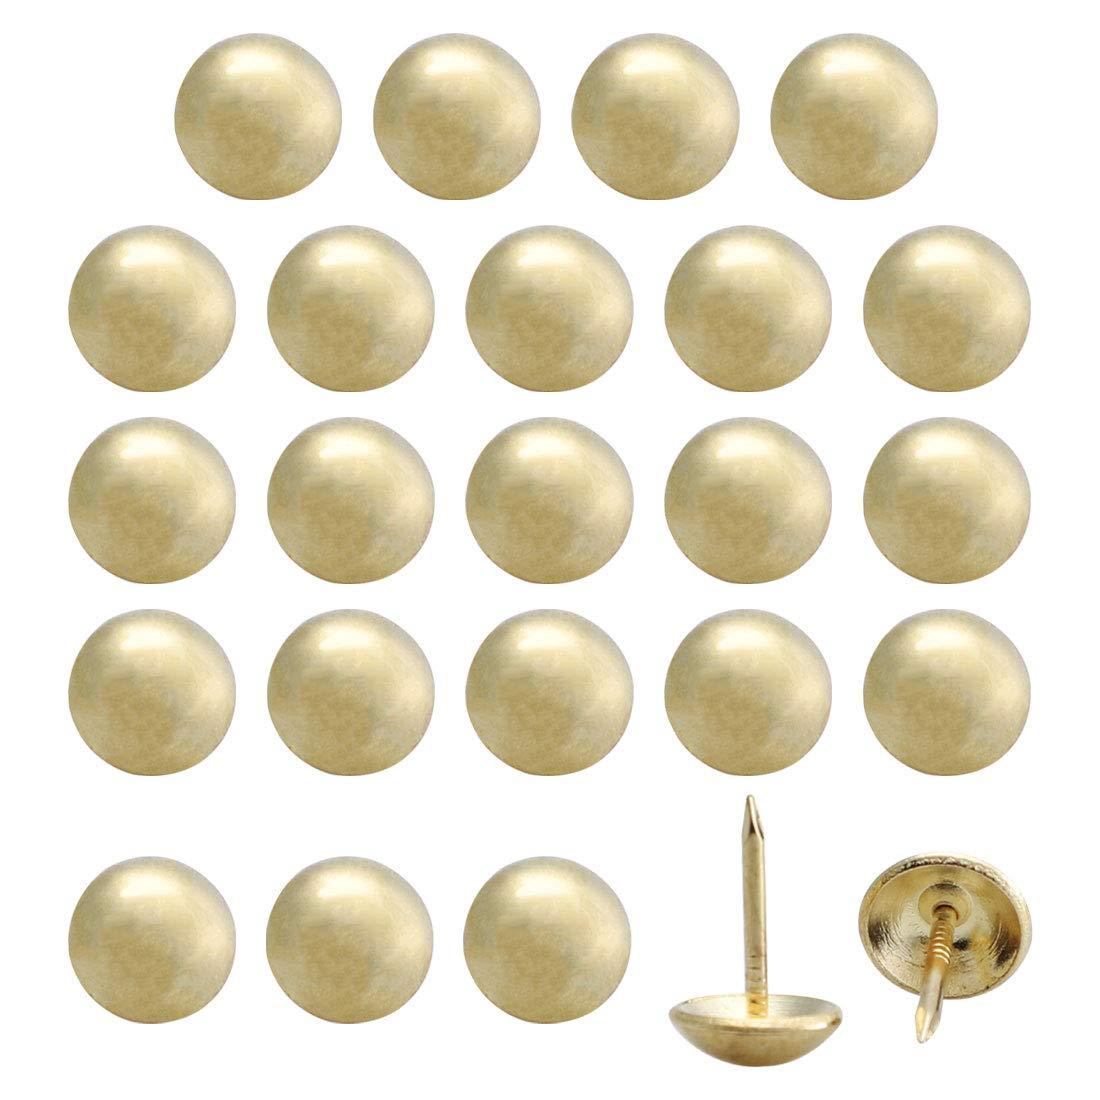 uxcell 24pcs Furniture Tack Nails Pins 14mm Dia Round Head Metal Thumbtack Vintage Style DIY Sofa Headboard Crafts Decorate Gold Tone